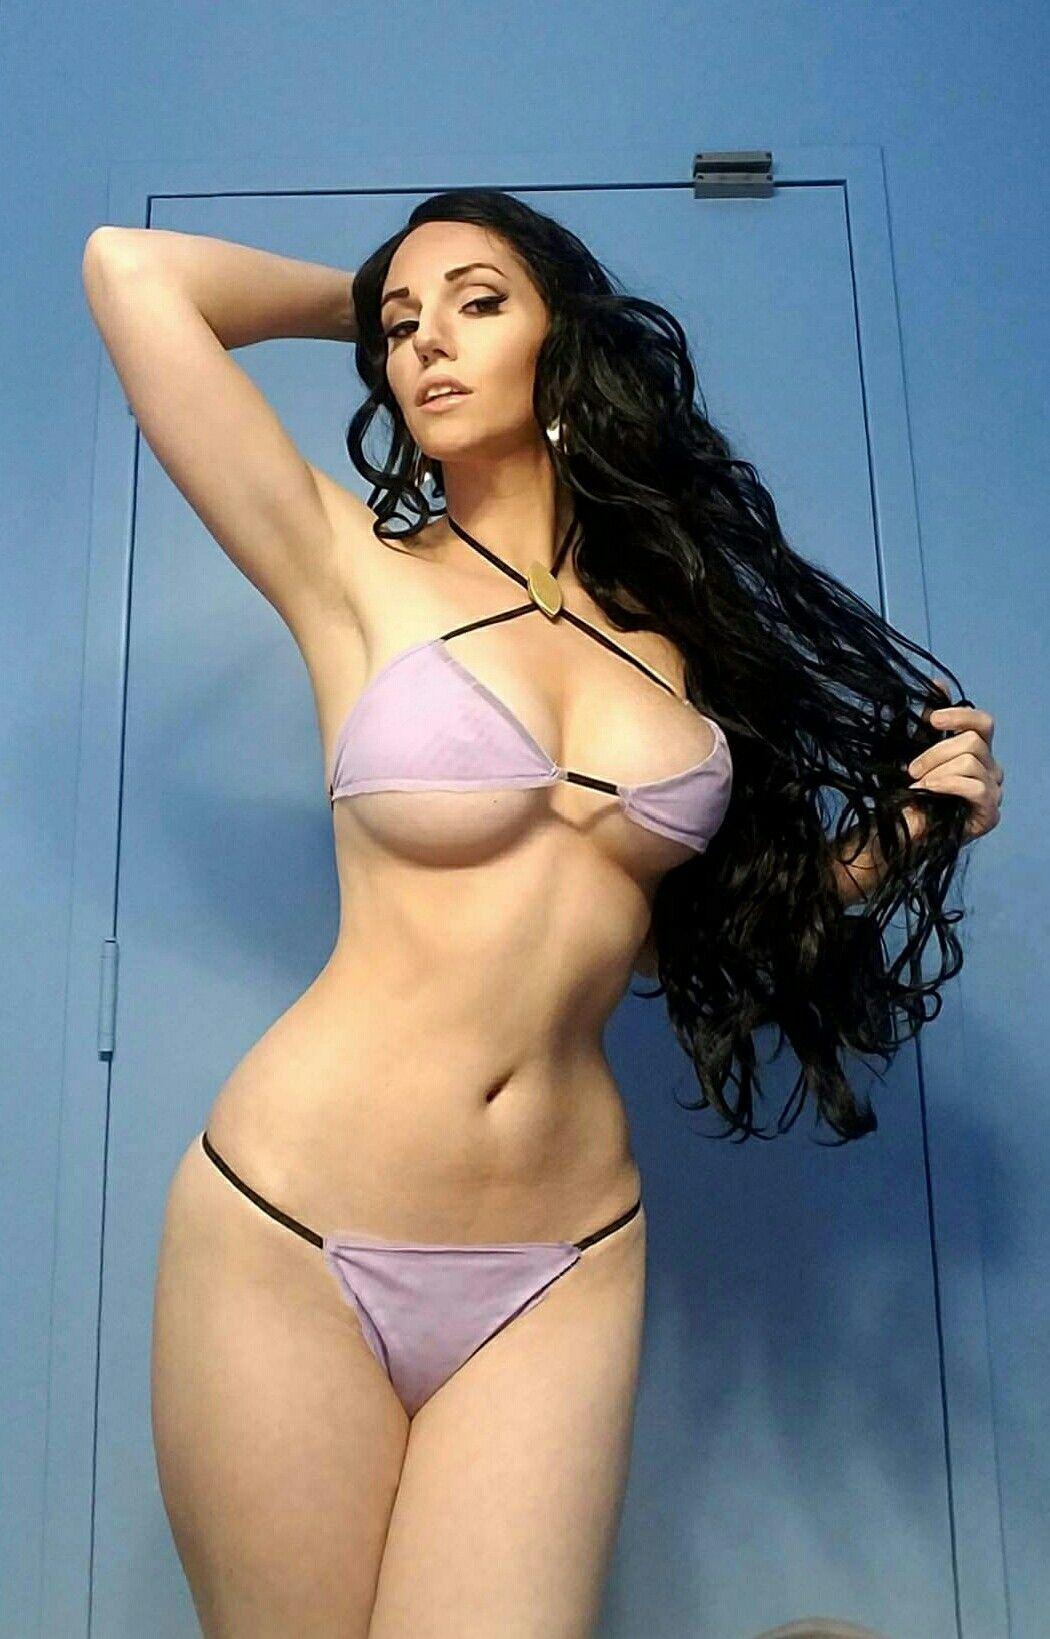 Jacqueline Goehner naked (45 pictures), foto Selfie, YouTube, underwear 2019